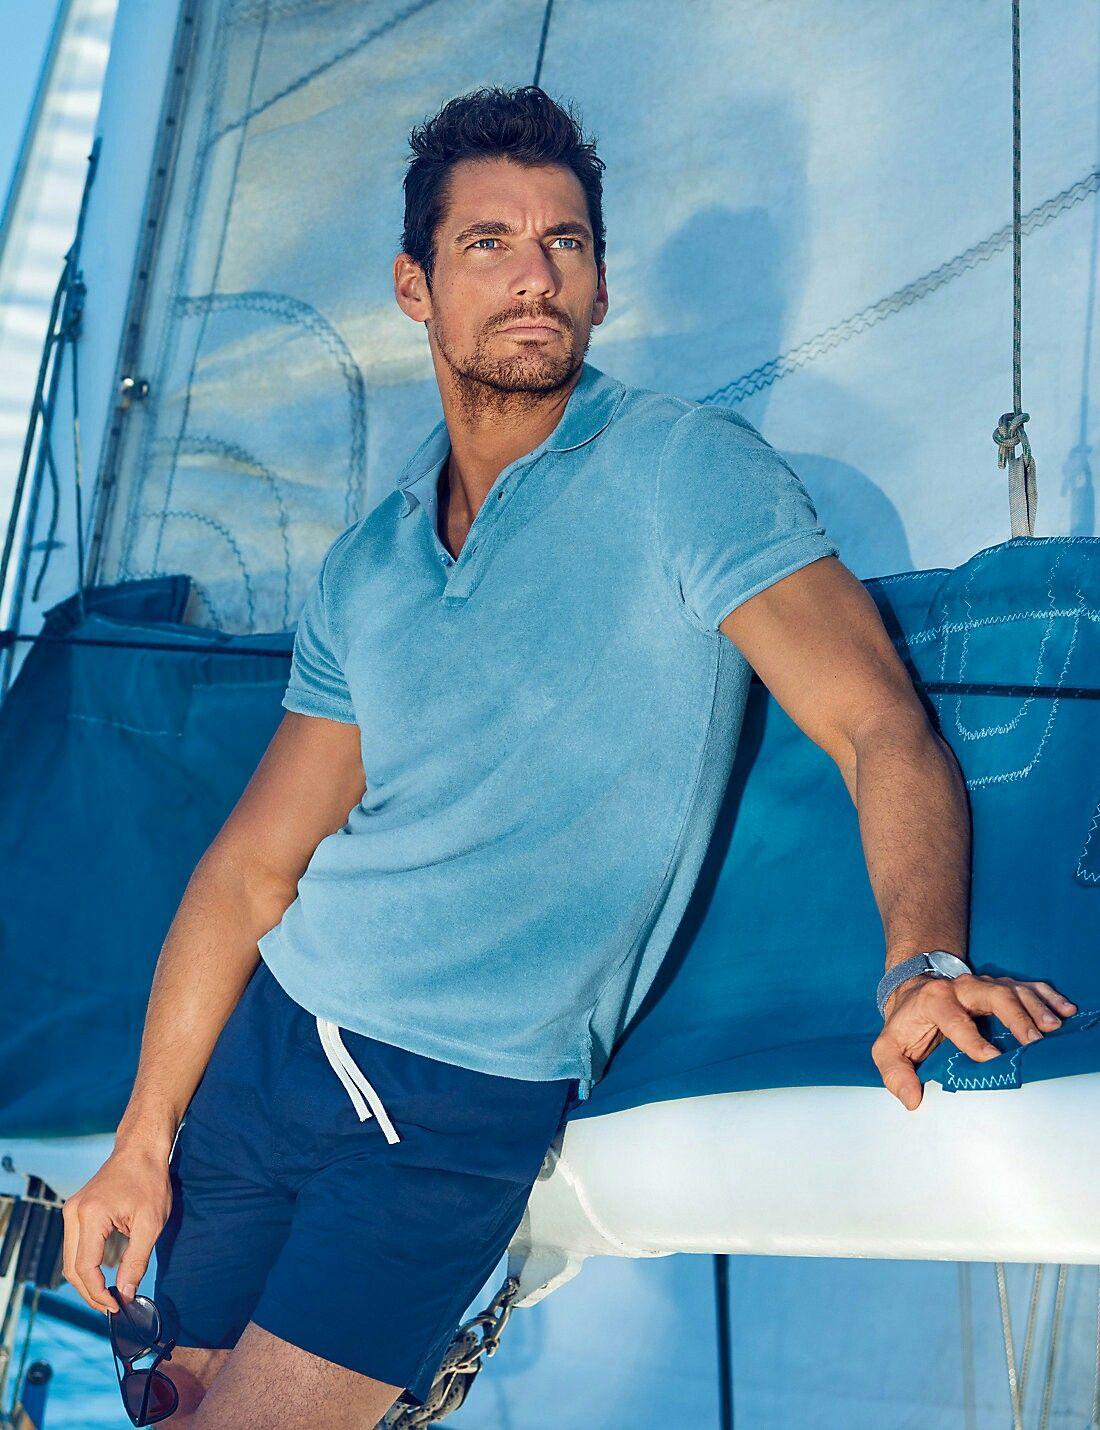 242c53c919 New || David Gandy for @M&S #GandyForAutograph Beachwear Collection SS16